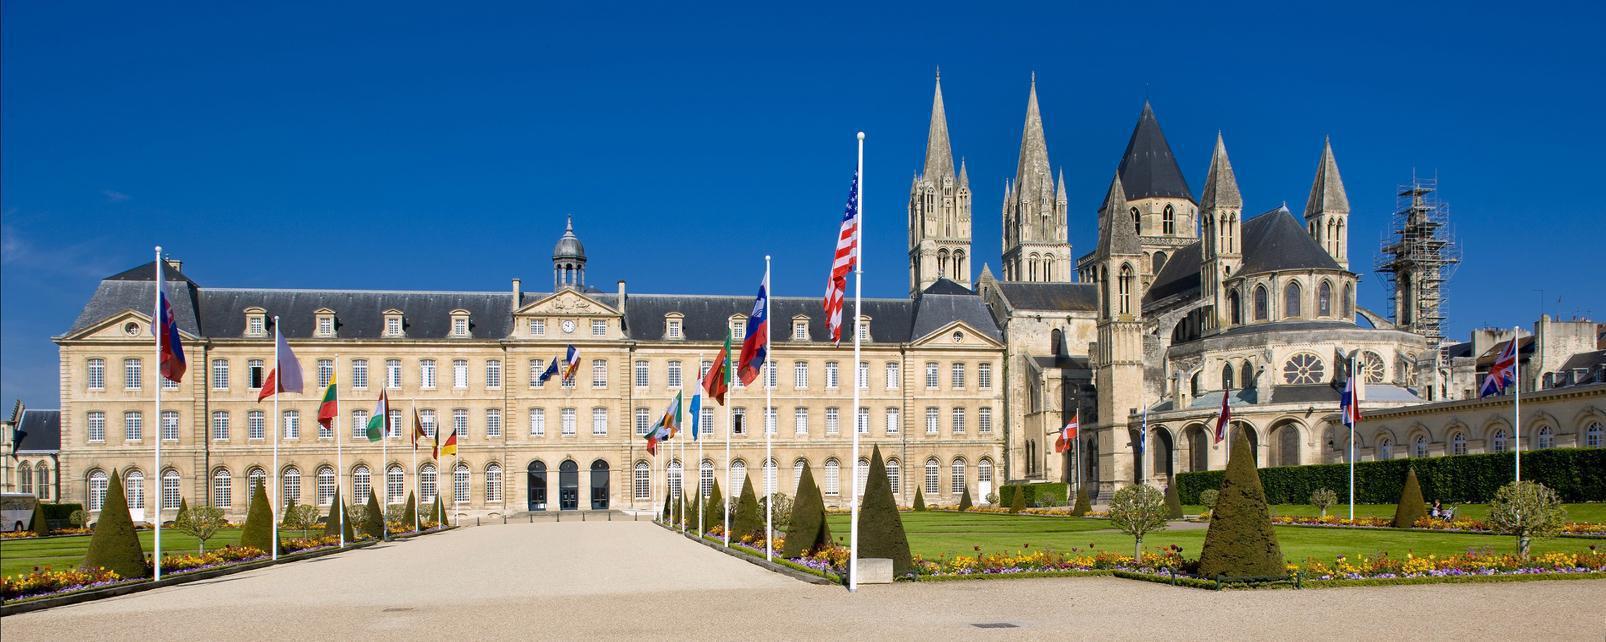 Pr visions m t o caen en juin quand partir for Design hotel normandie france